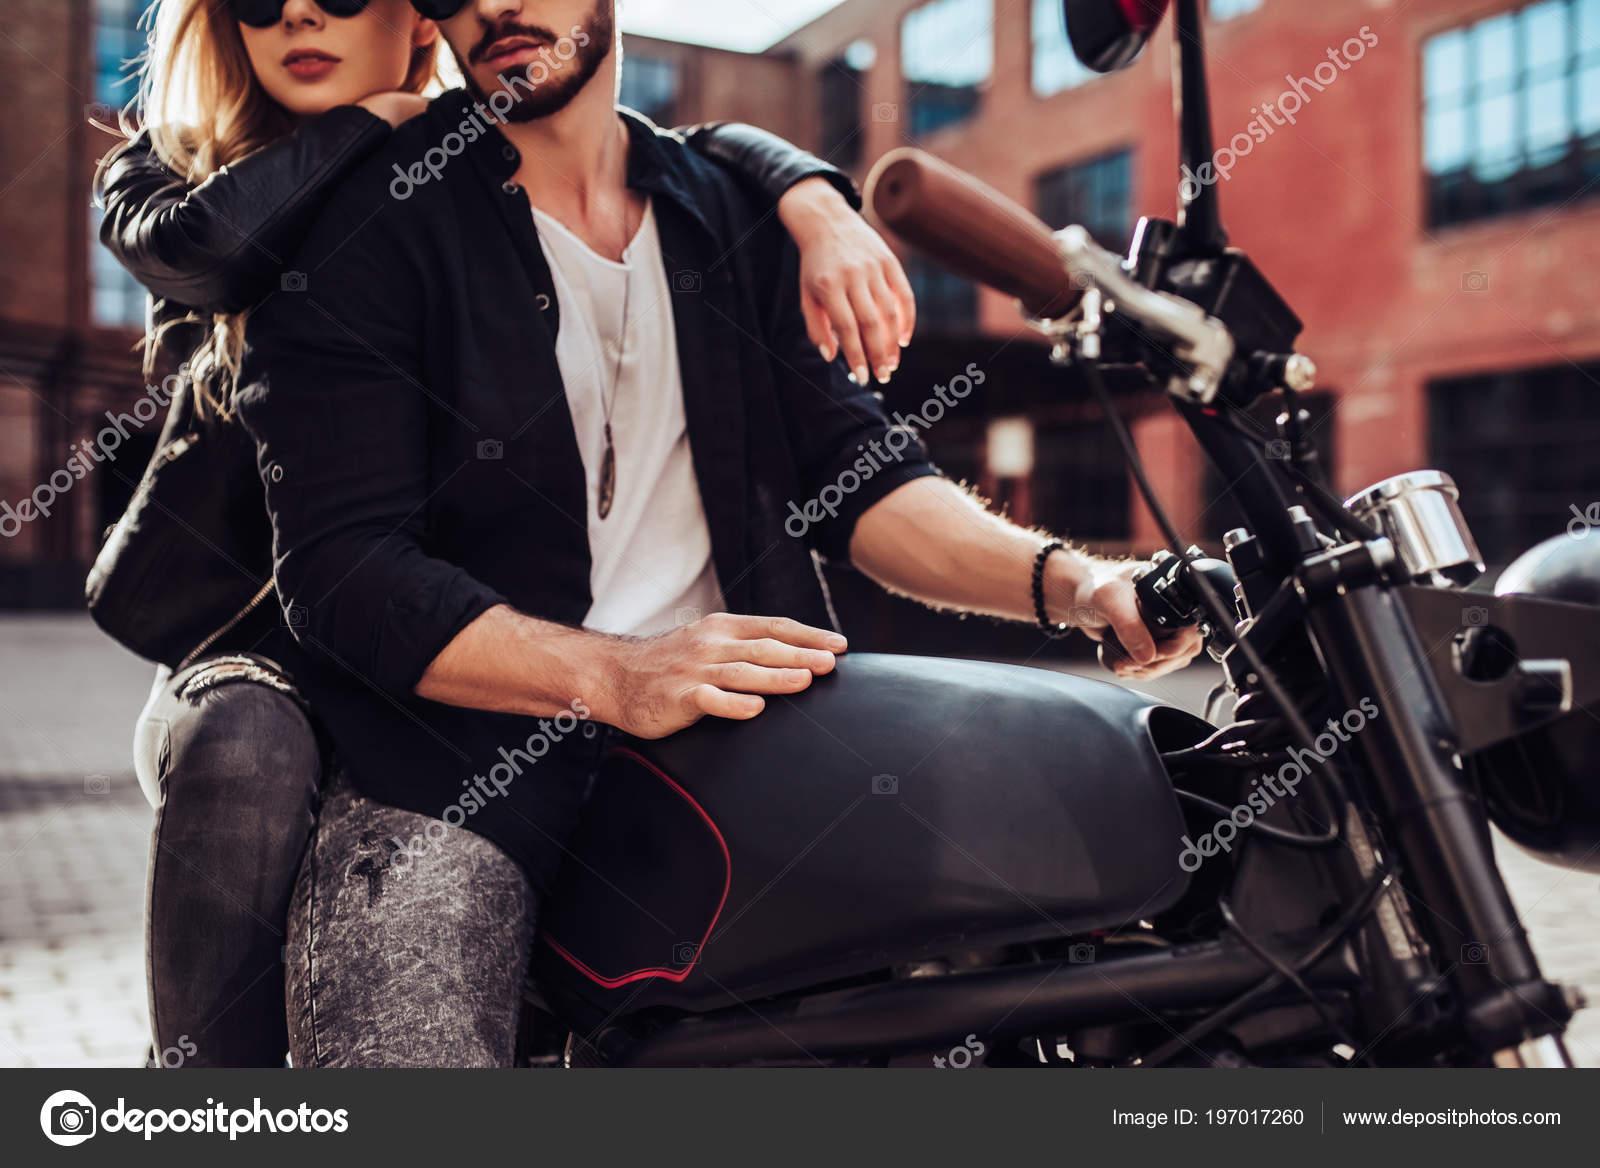 ᐈ Couple Bikers Stock Photos Royalty Free Biker Couple Images Download On Depositphotos